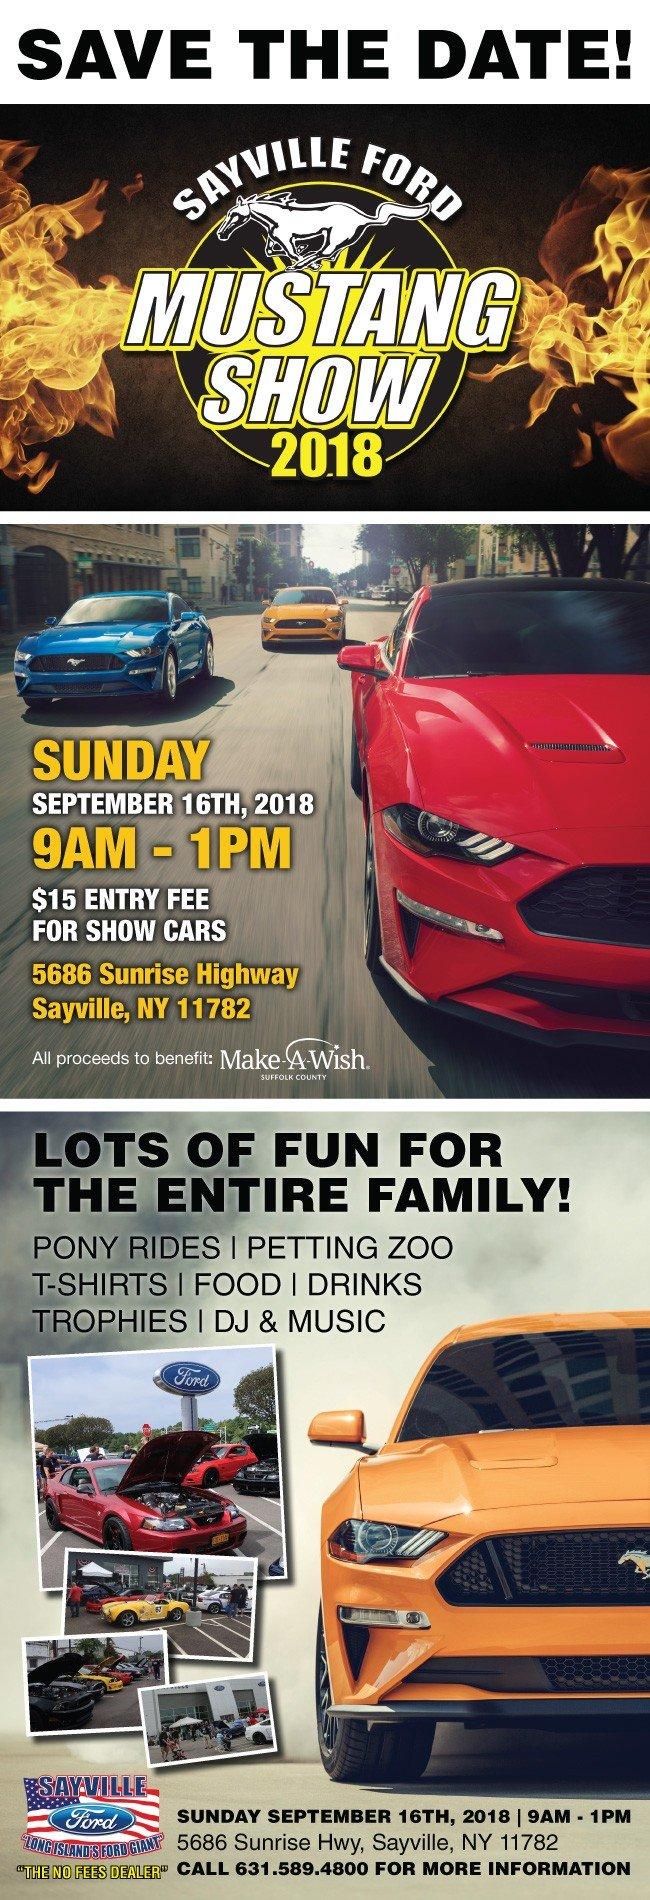 2018 Mustang Show